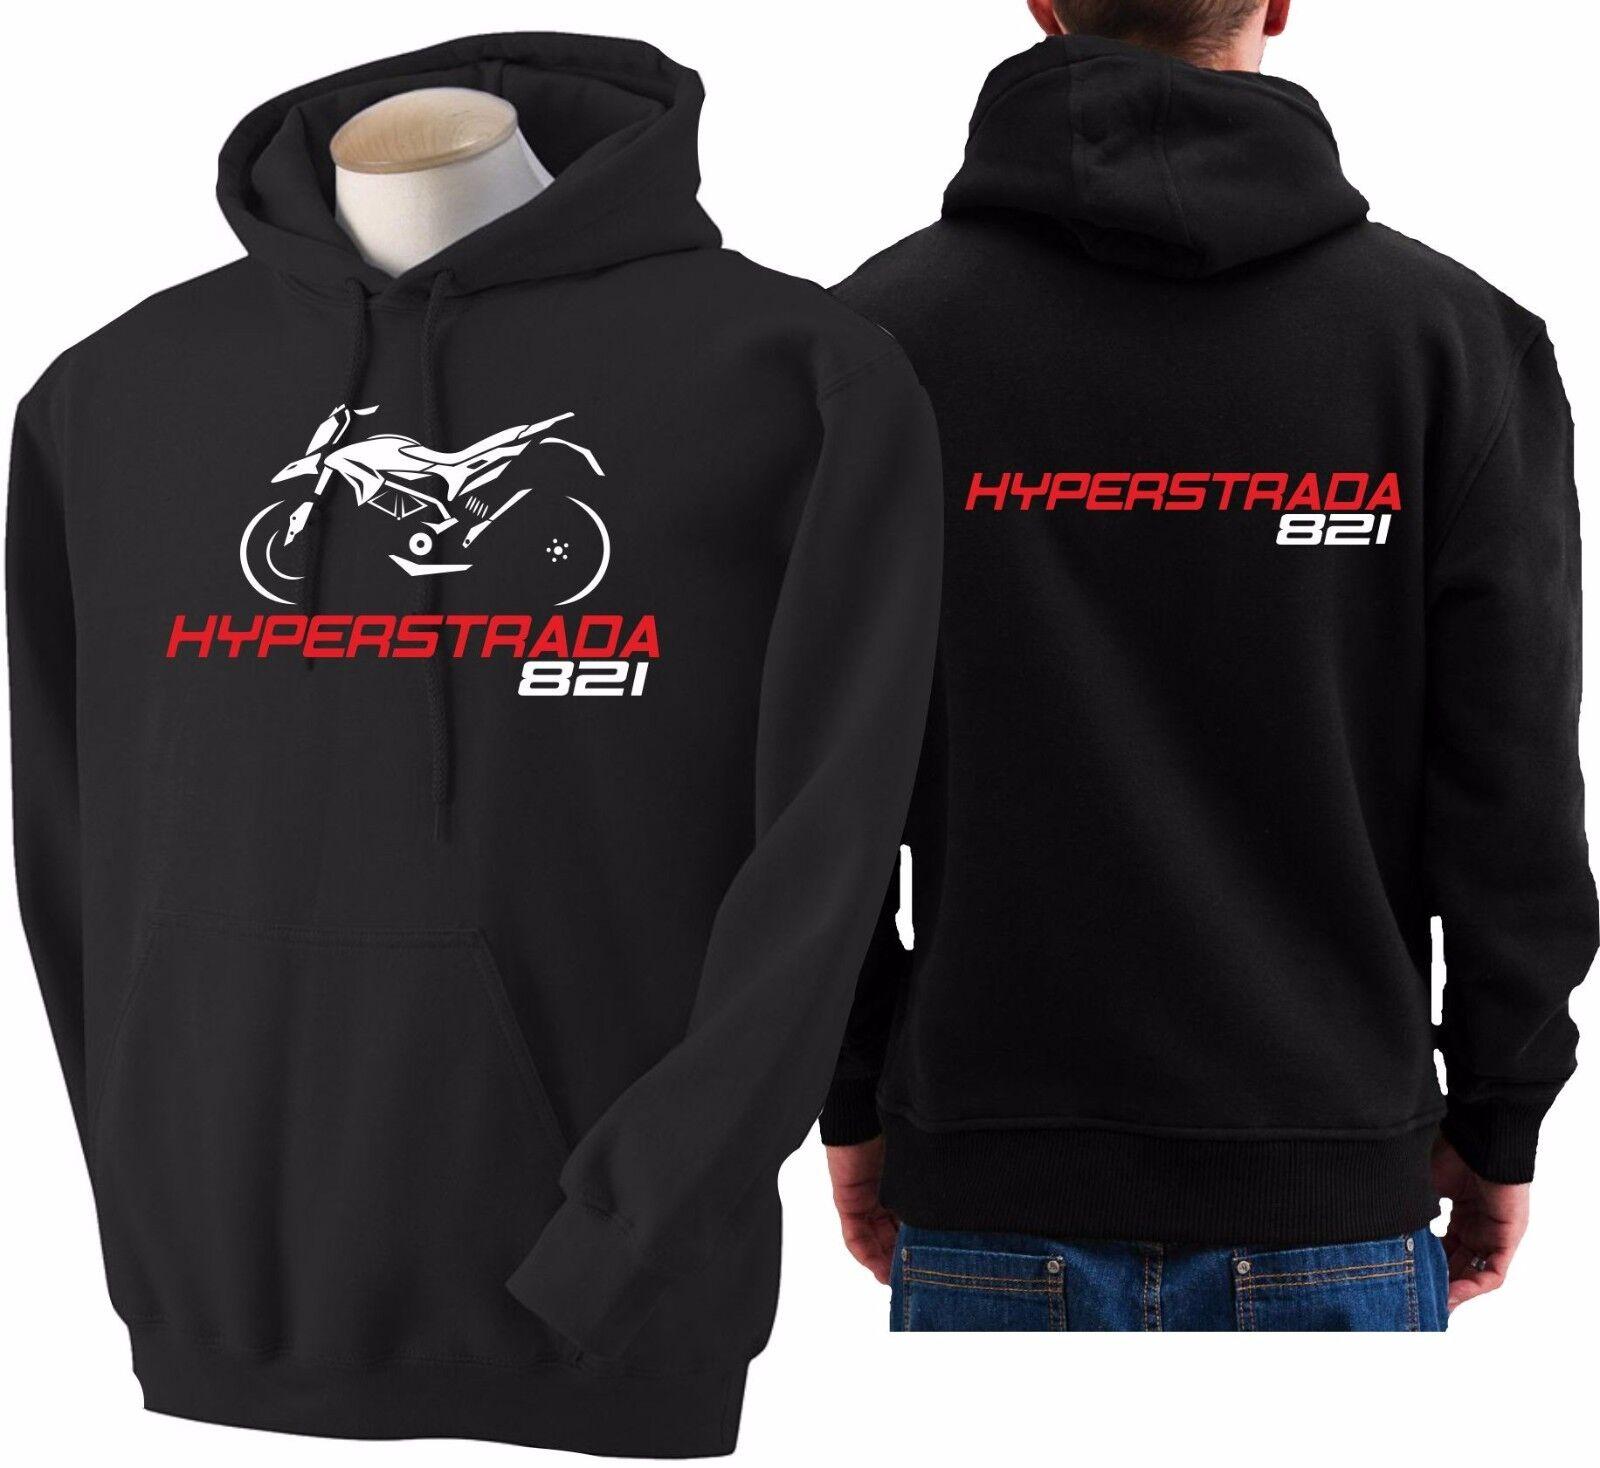 Hoodie for bike DUCATI HYPERSTRADA 821 sweatshirt hoody Sudadera moto sweater